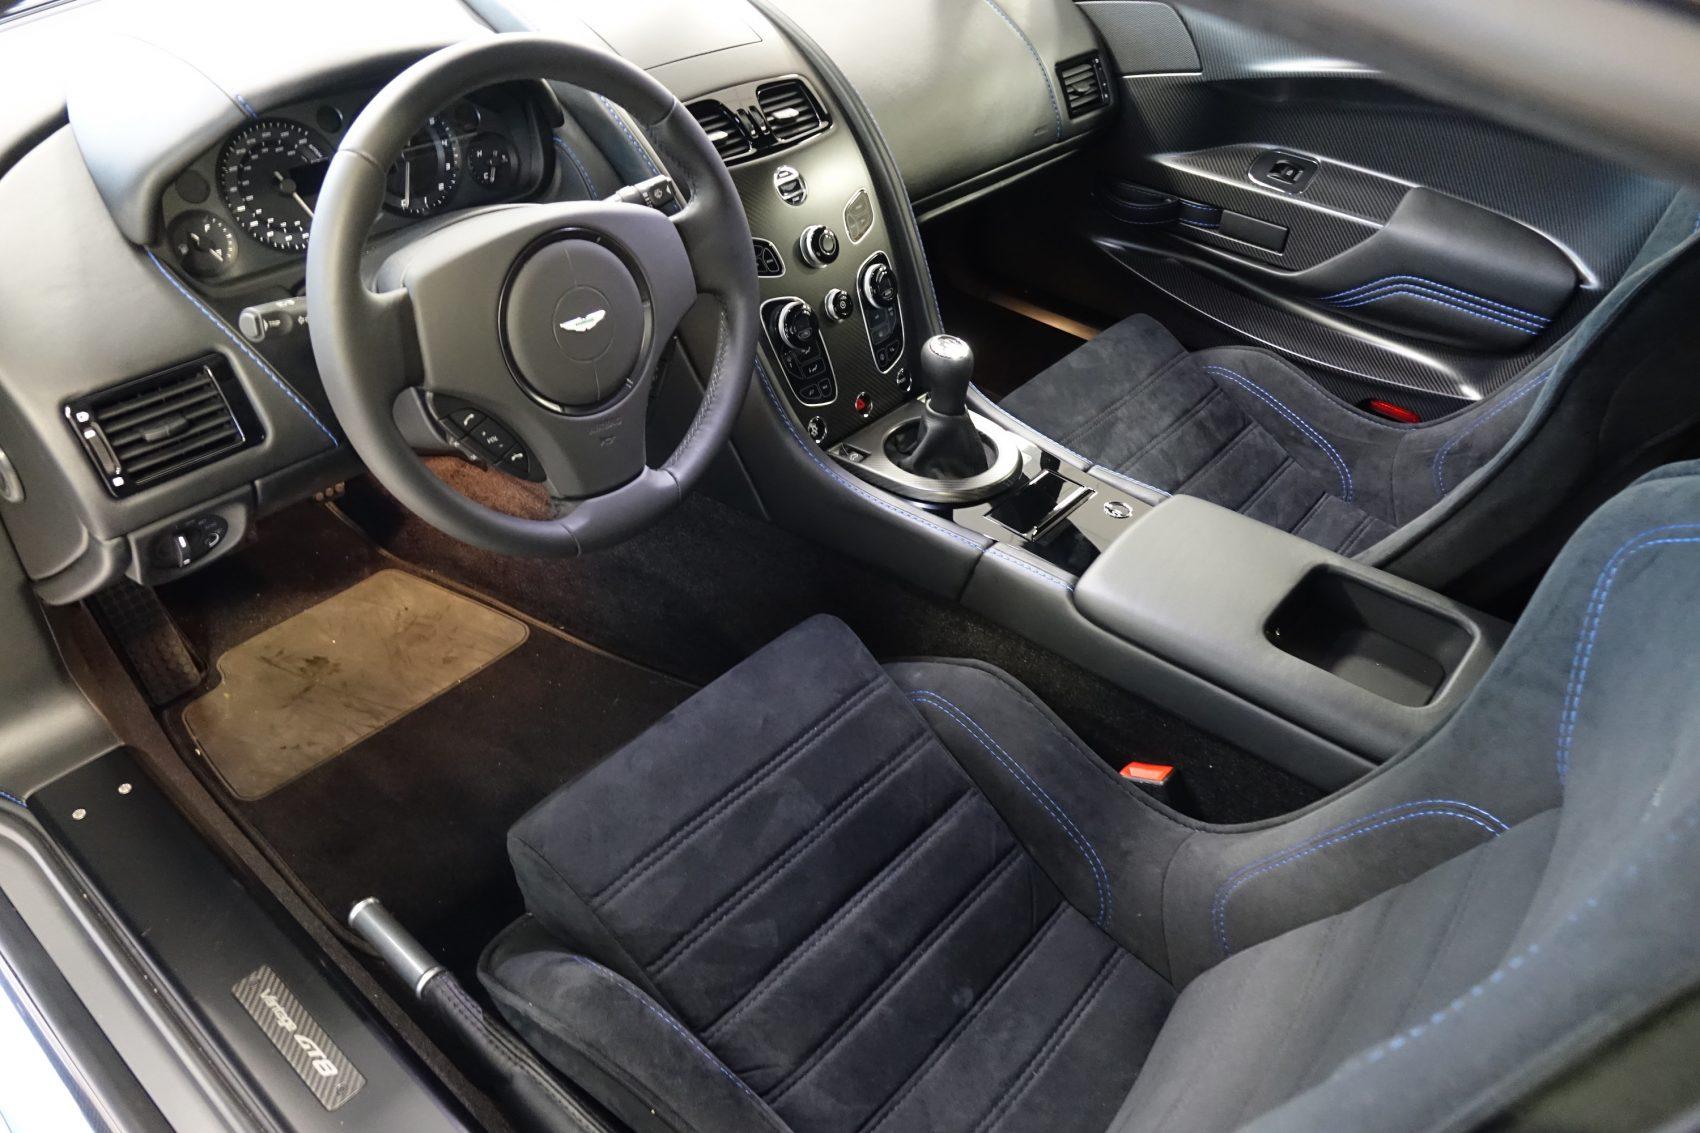 Aston Martin Vantage Gt8 1 Of 150 Assetto Corsa